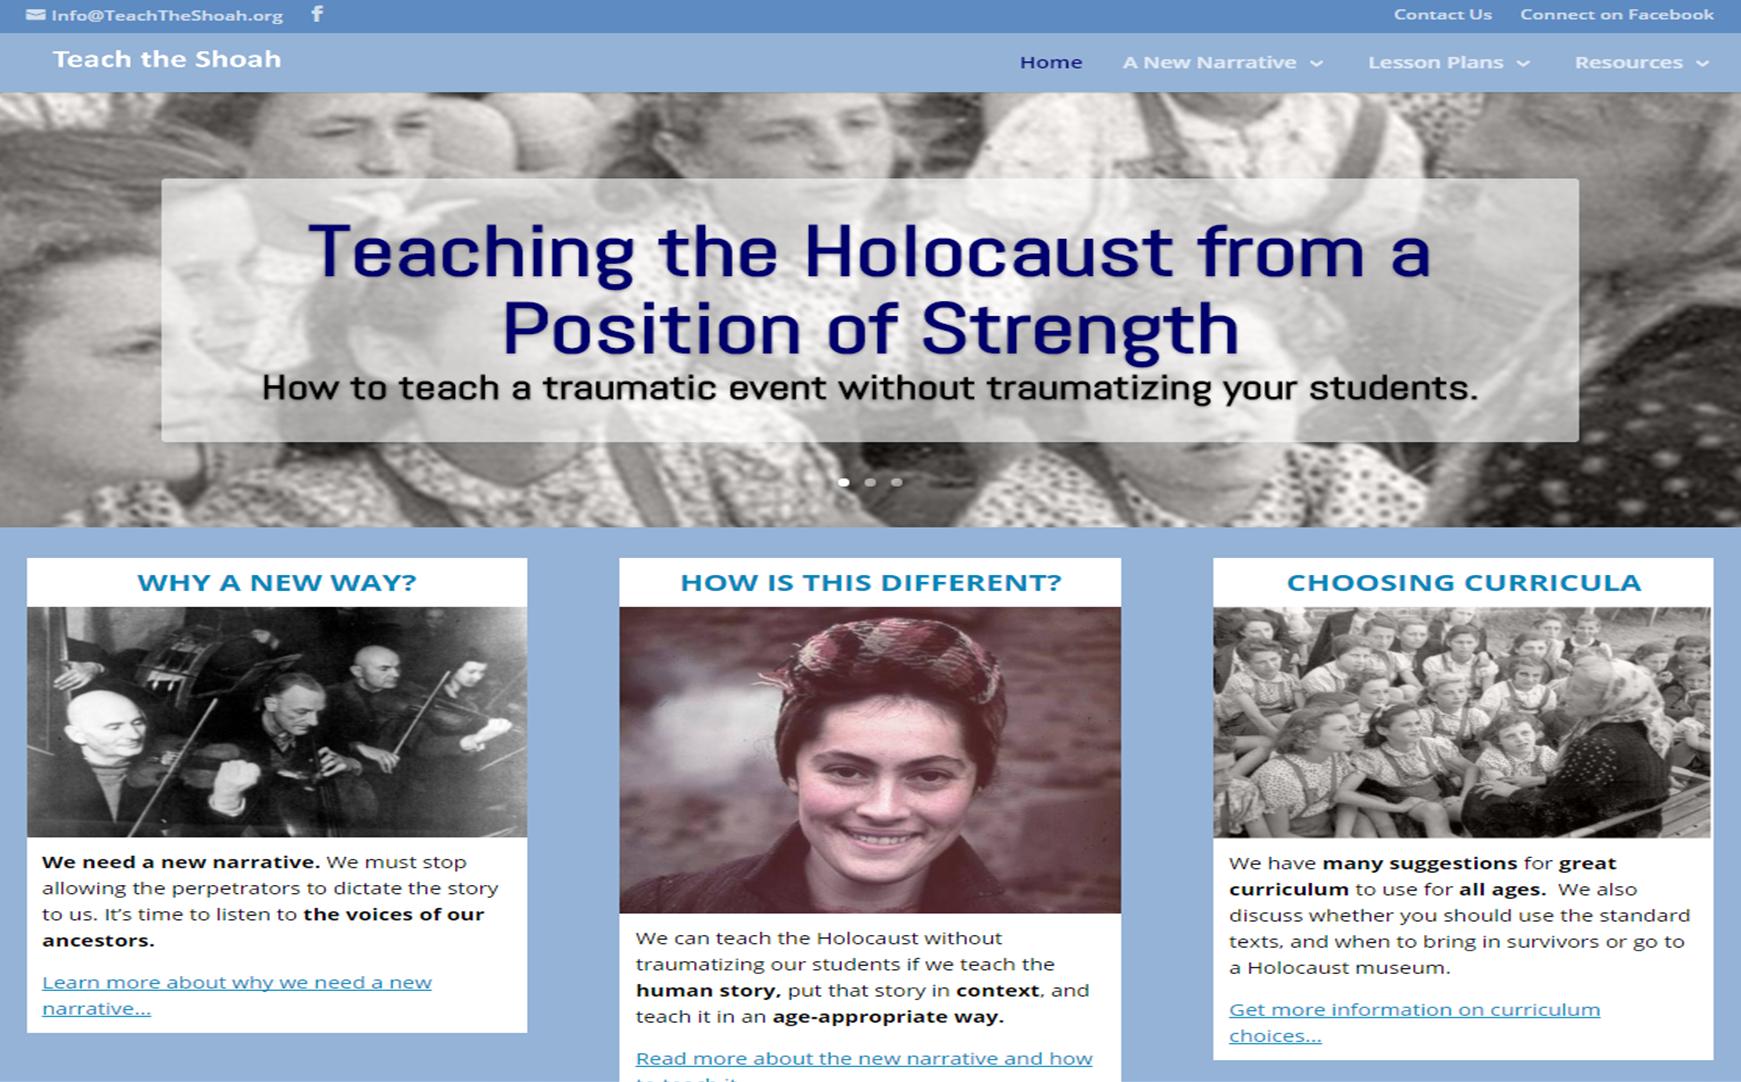 Teach the Shoah